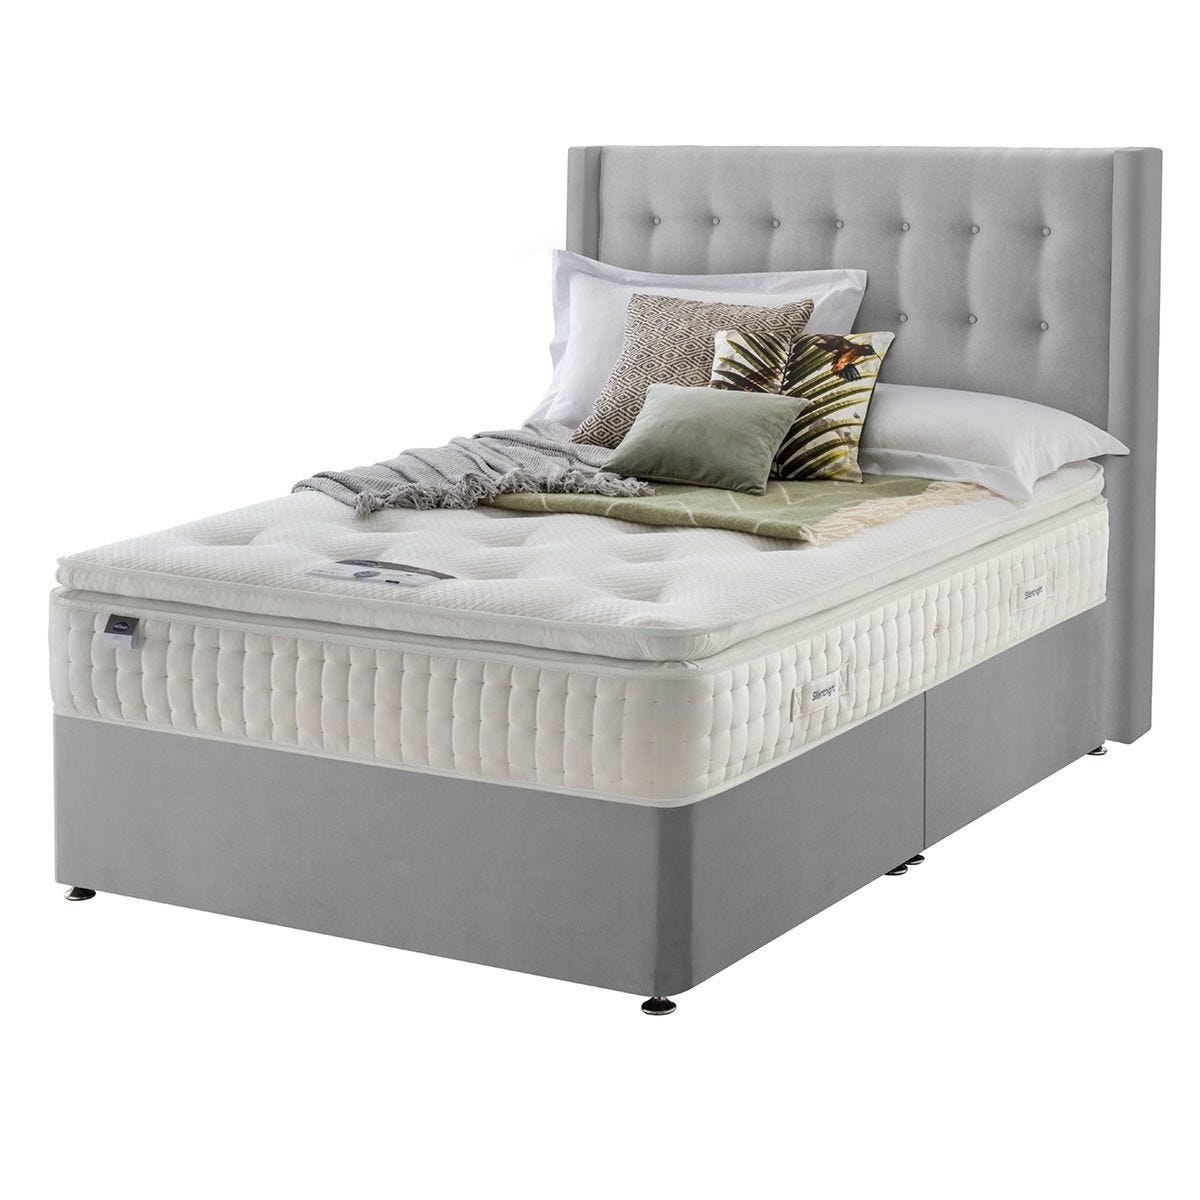 Silentnight Mirapocket Latex 1400 Non Storage Divan Bed - Velvet Silver Double